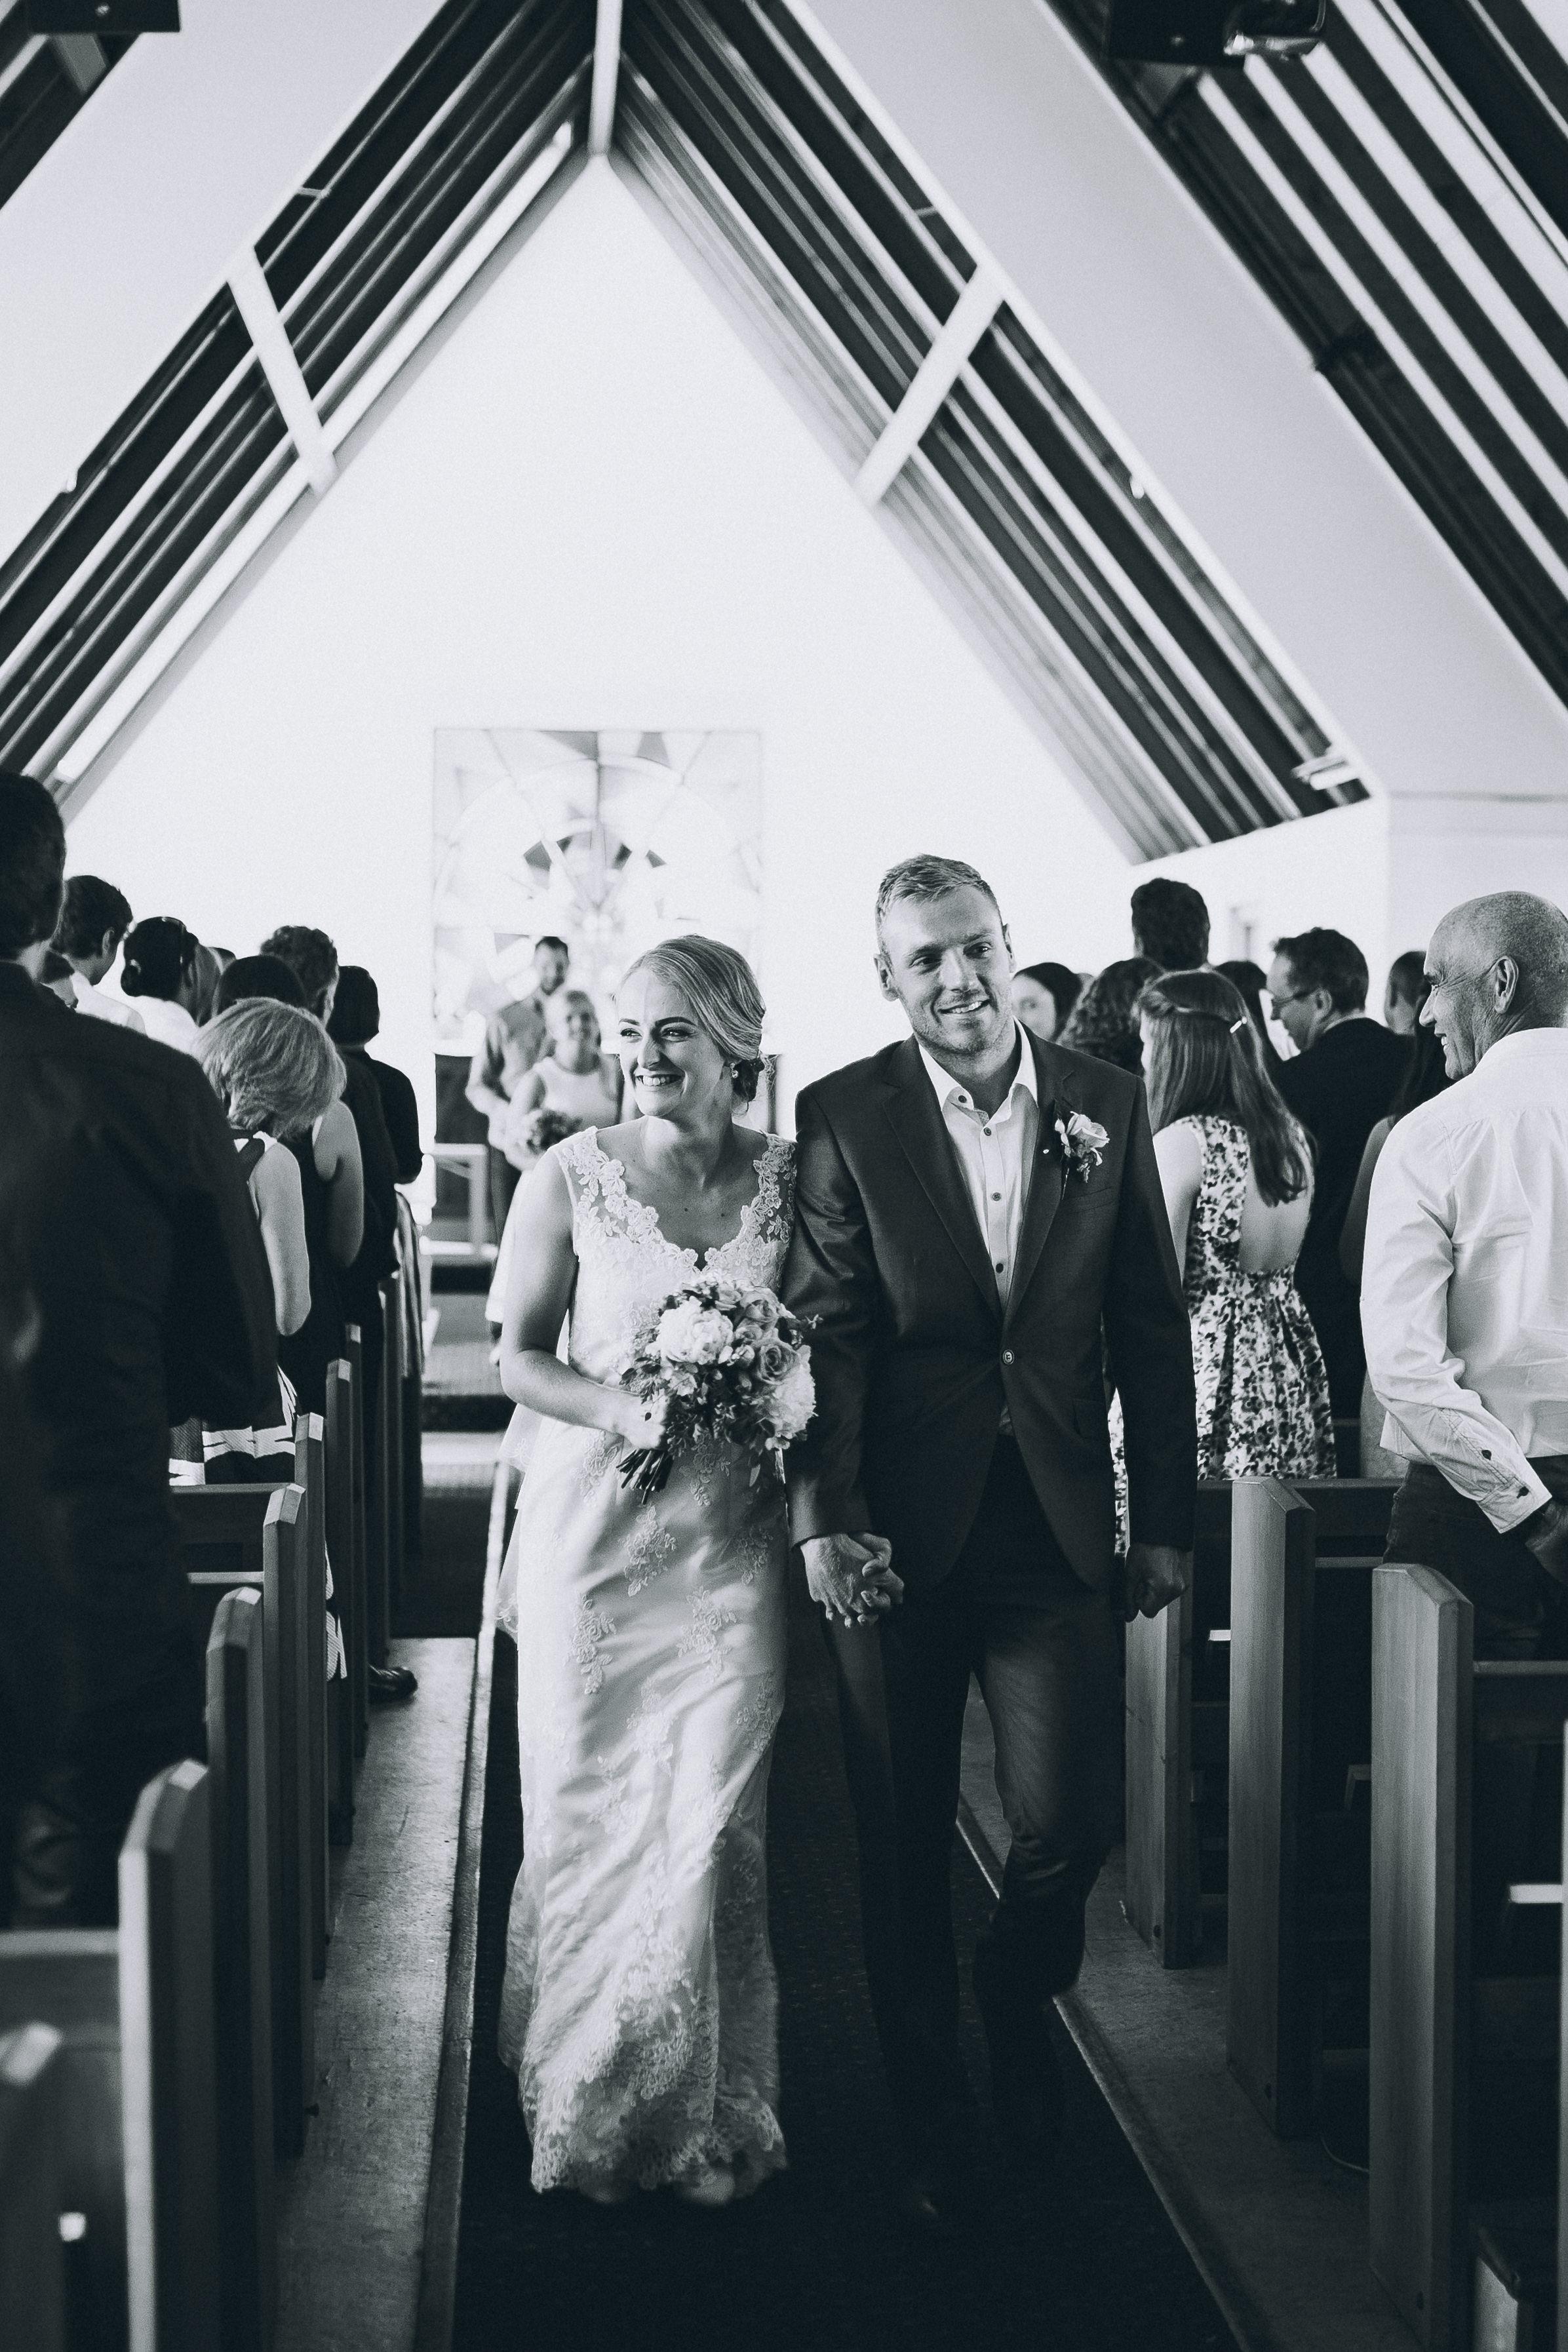 Shivonne & James - Ceremony Monochrome-195.jpg